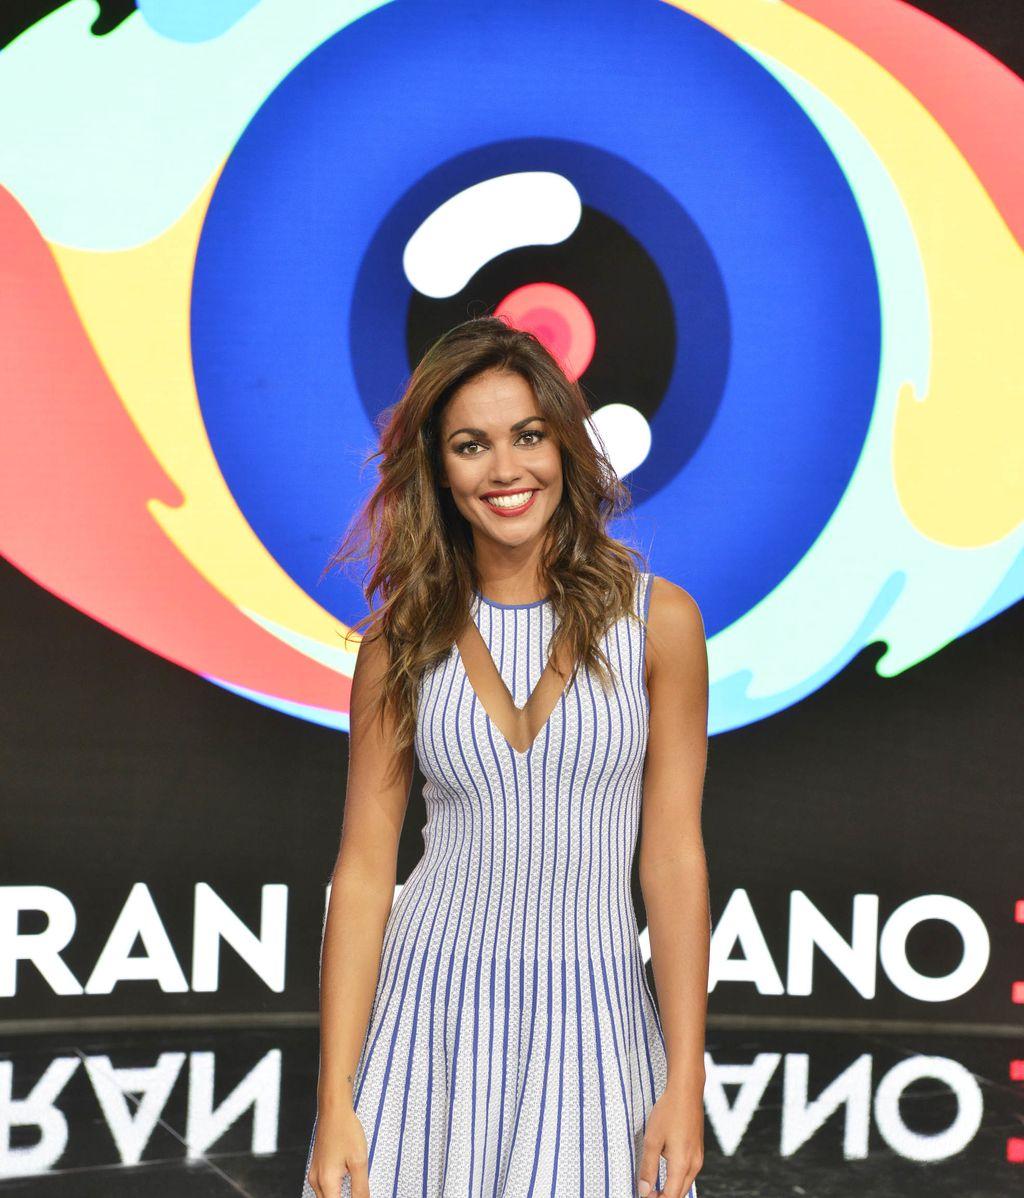 Lara Álvarez Gran hermano 17